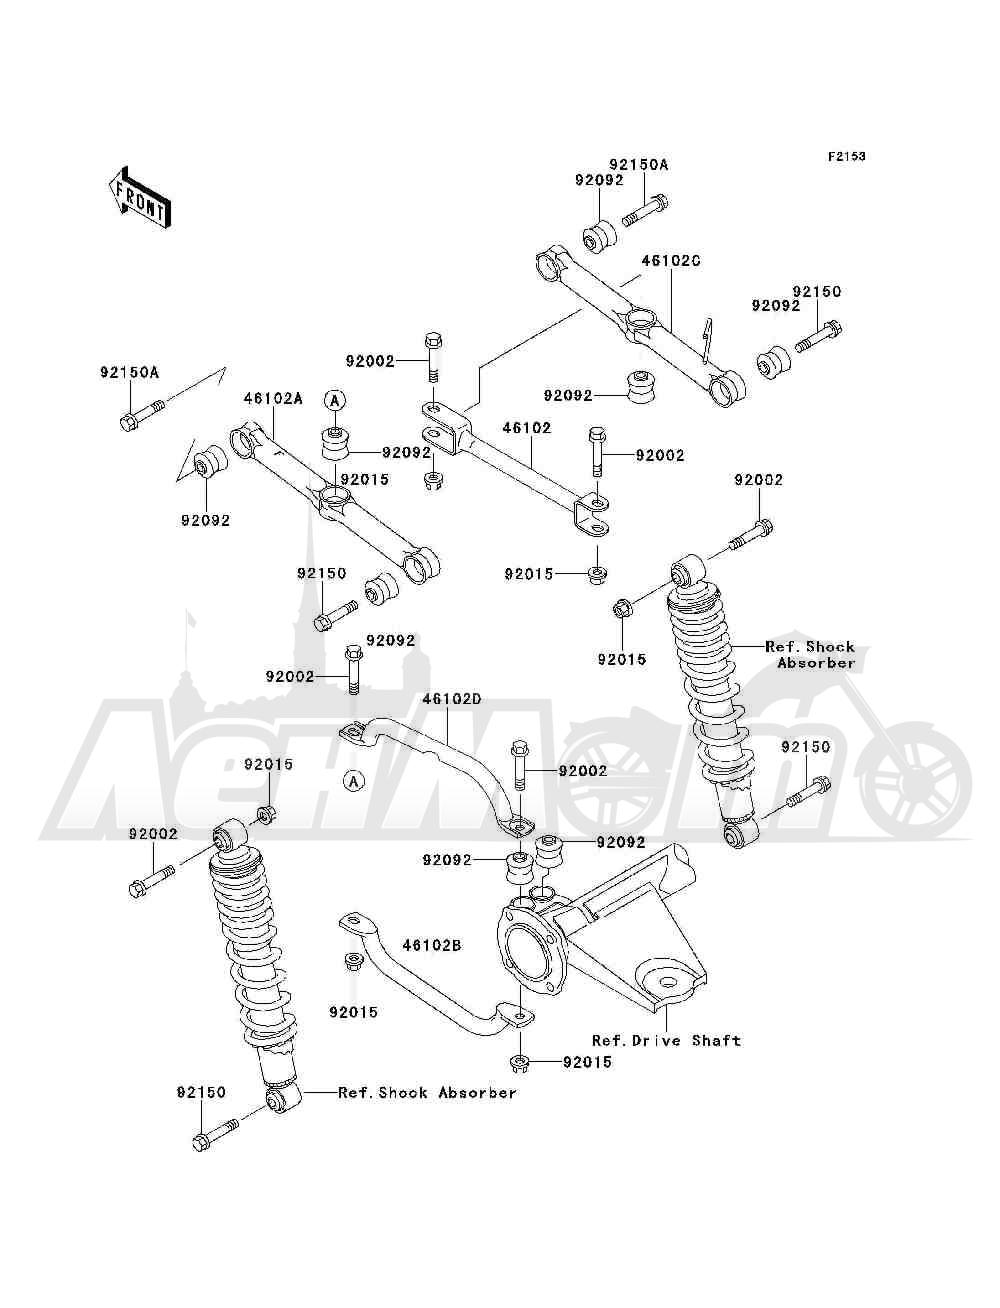 Запчасти для Квадроцикла Kawasaki 1993 BAYOU 300 4X4 (KLF300-C5) Раздел: REAR SUSPENSION | задняя подвеска